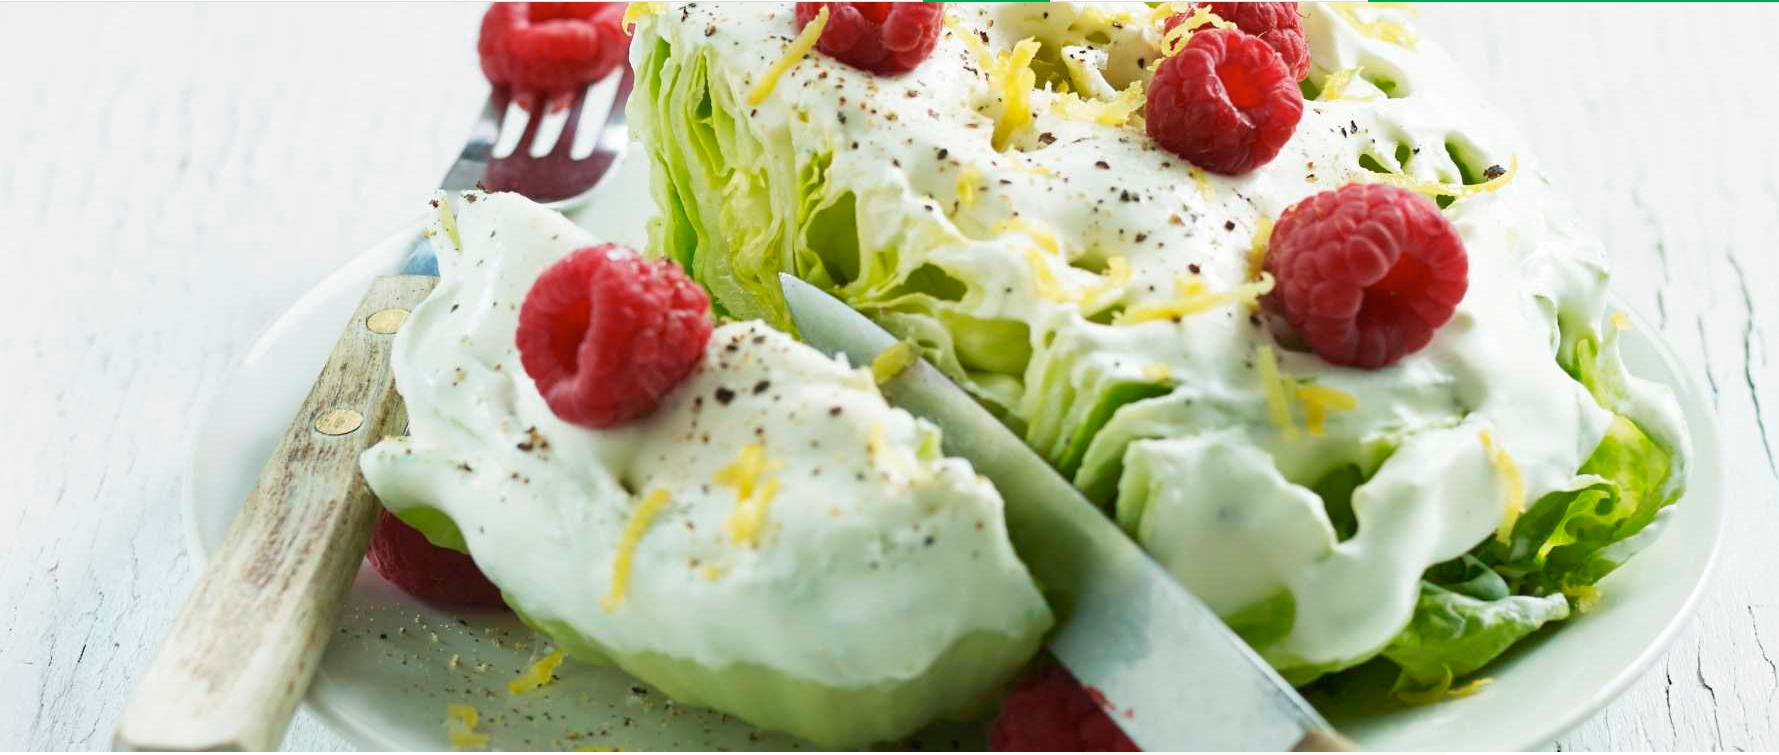 Bringebær er et friskt tilskudd til salaten.